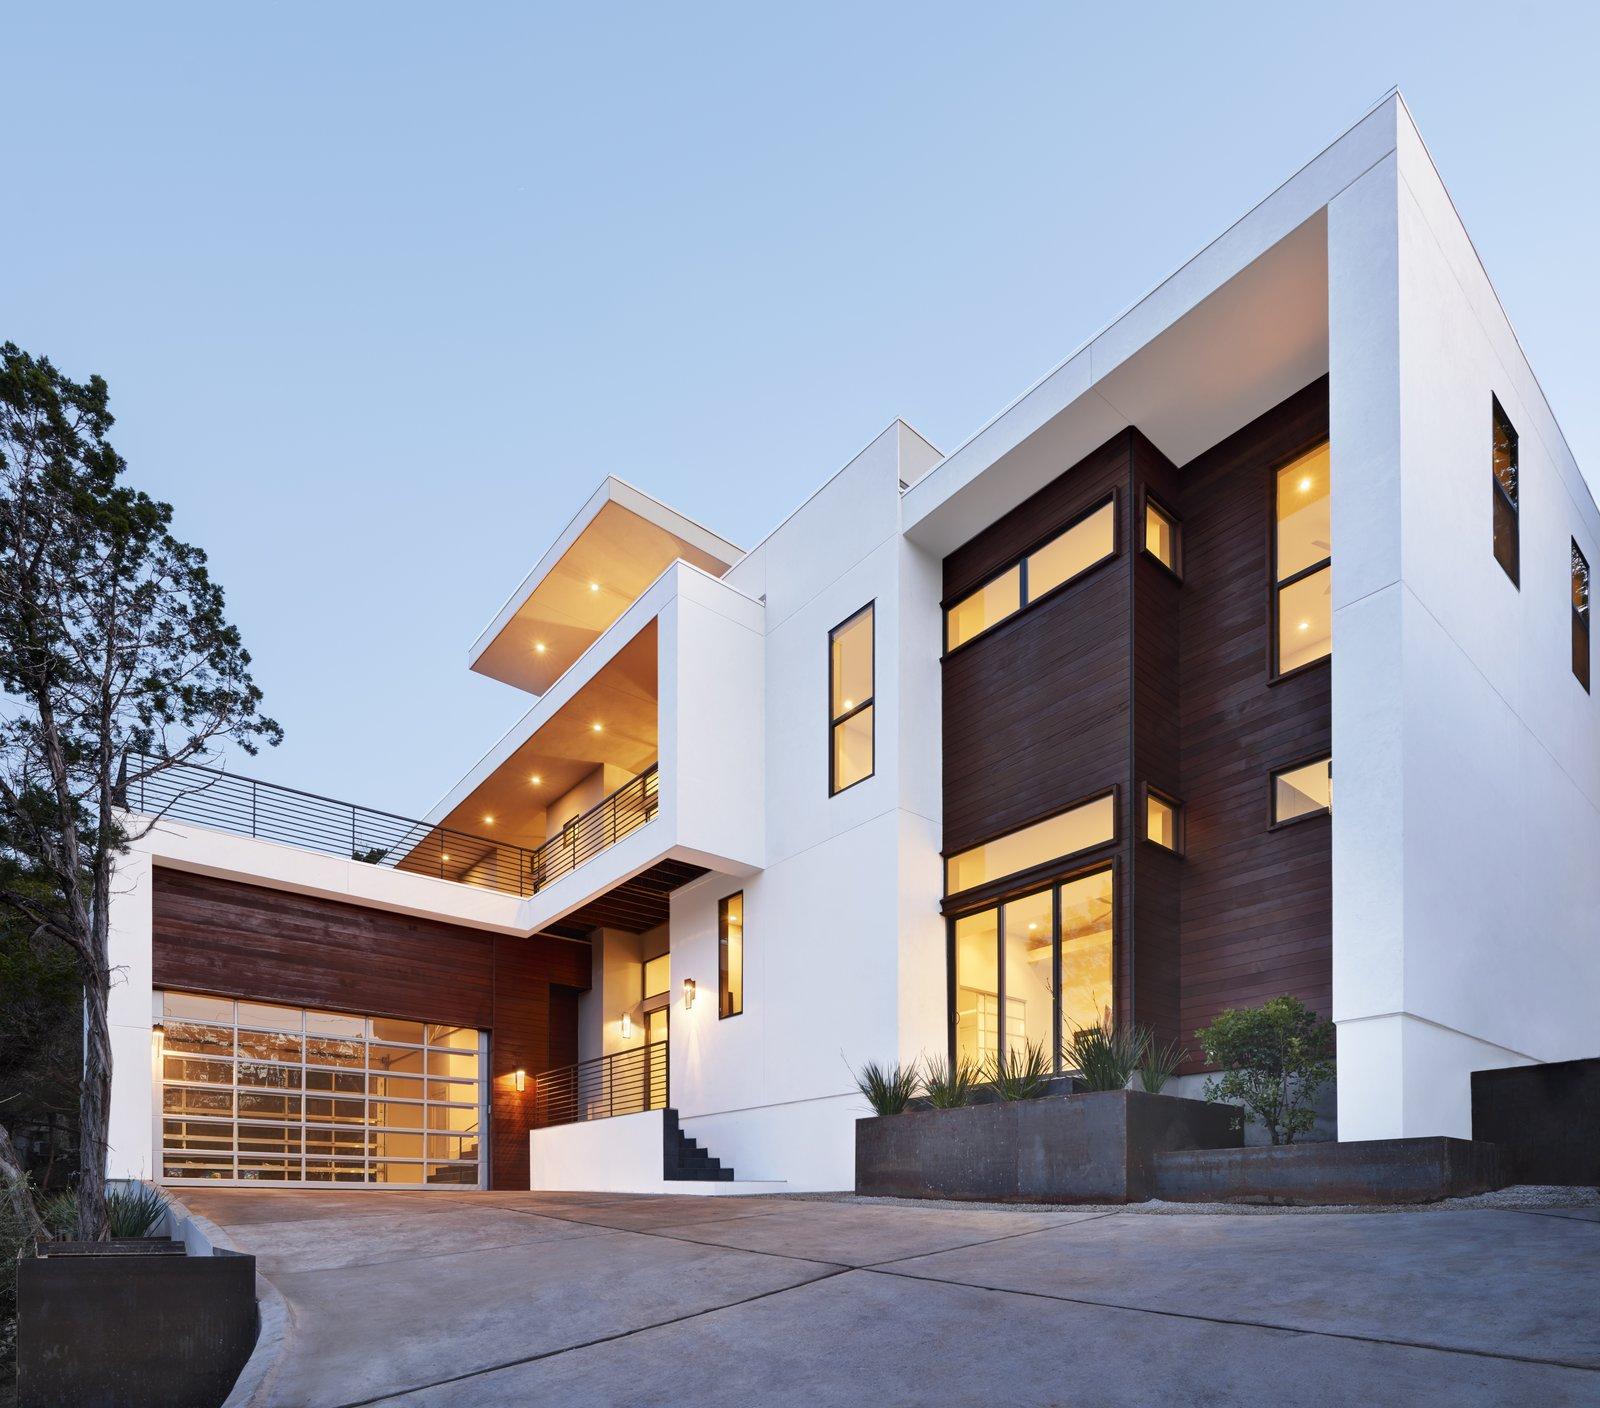 Westlake4 Modern Home In West Lake Hills Texas By J